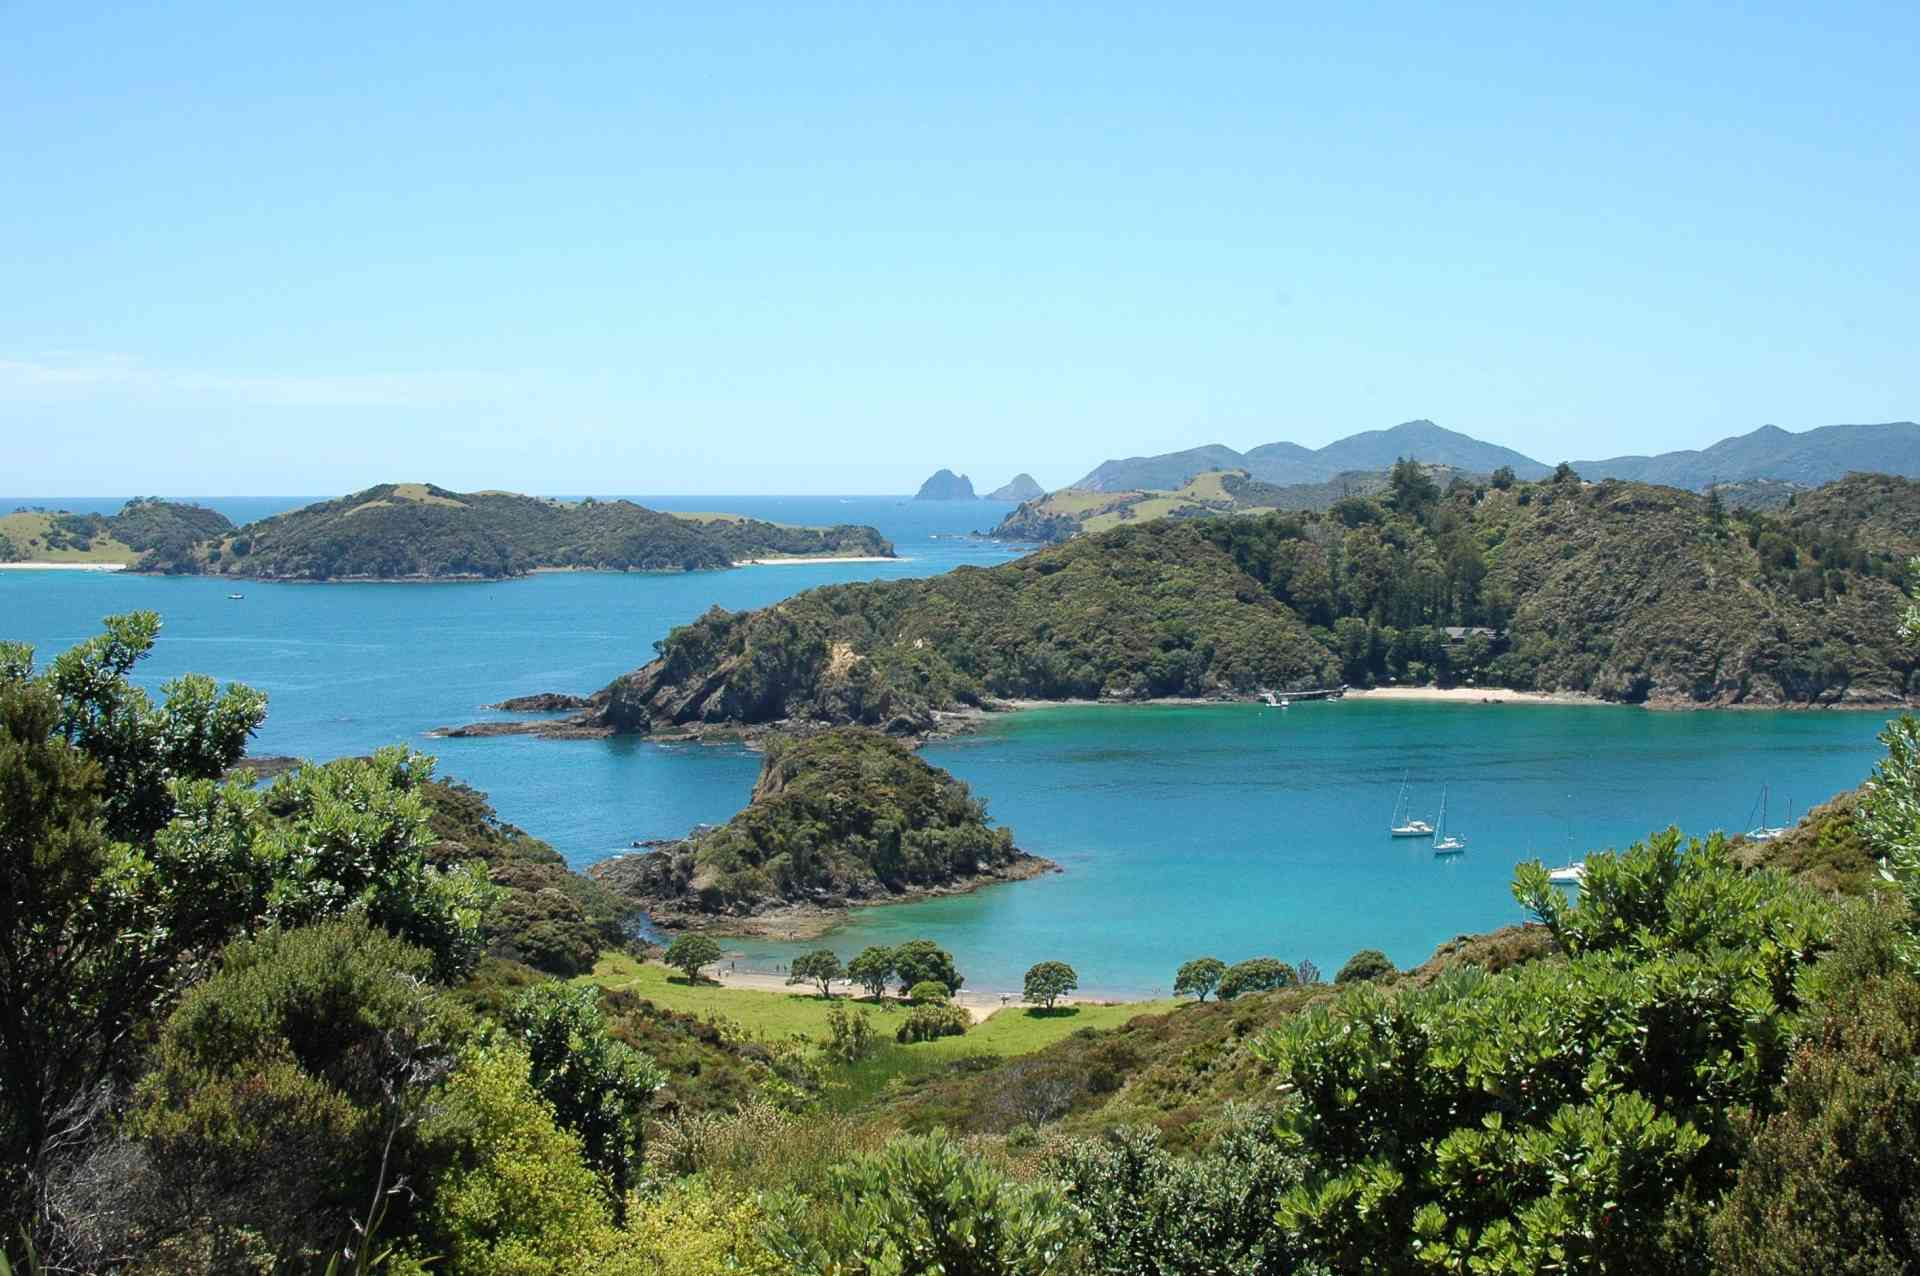 Bay of Islands, New Zealand by Linde Lanjouw